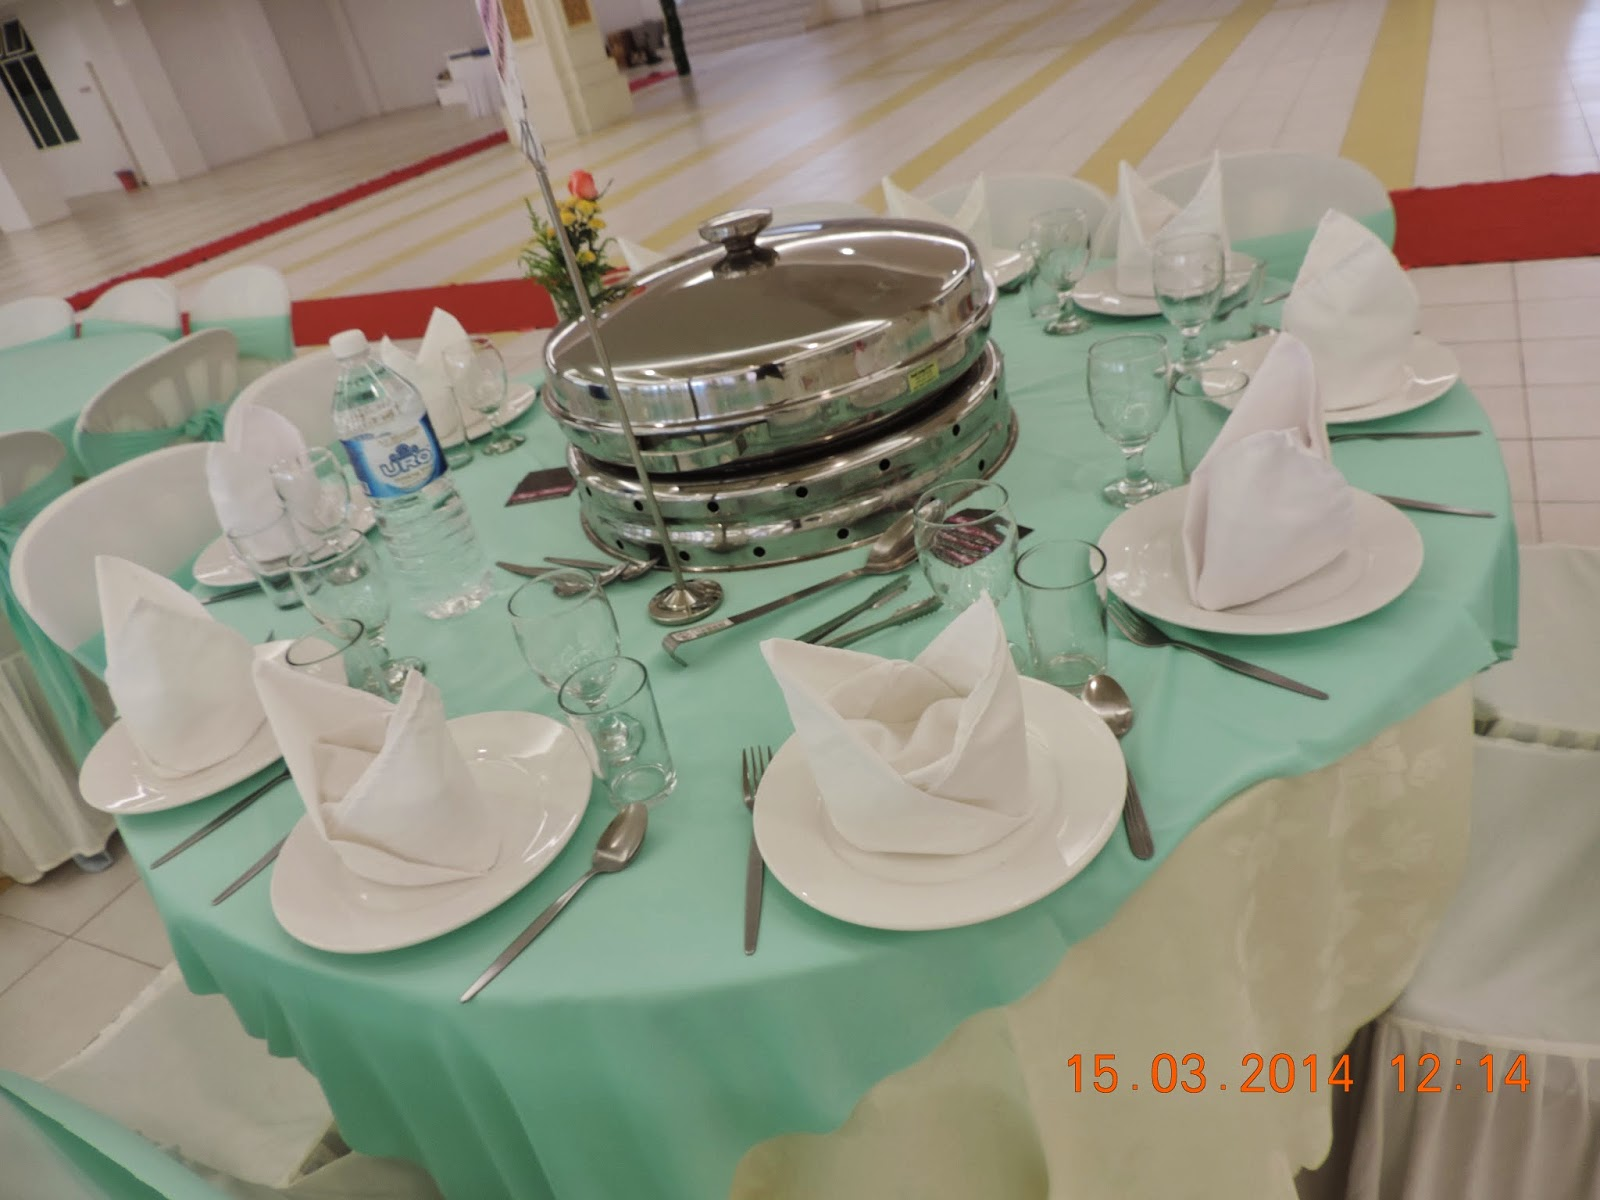 Hidangan Makan Beradab Susun Atur Meja Vip Ibunda Catering Services Wedding Dewan Masjid Ar Rahar